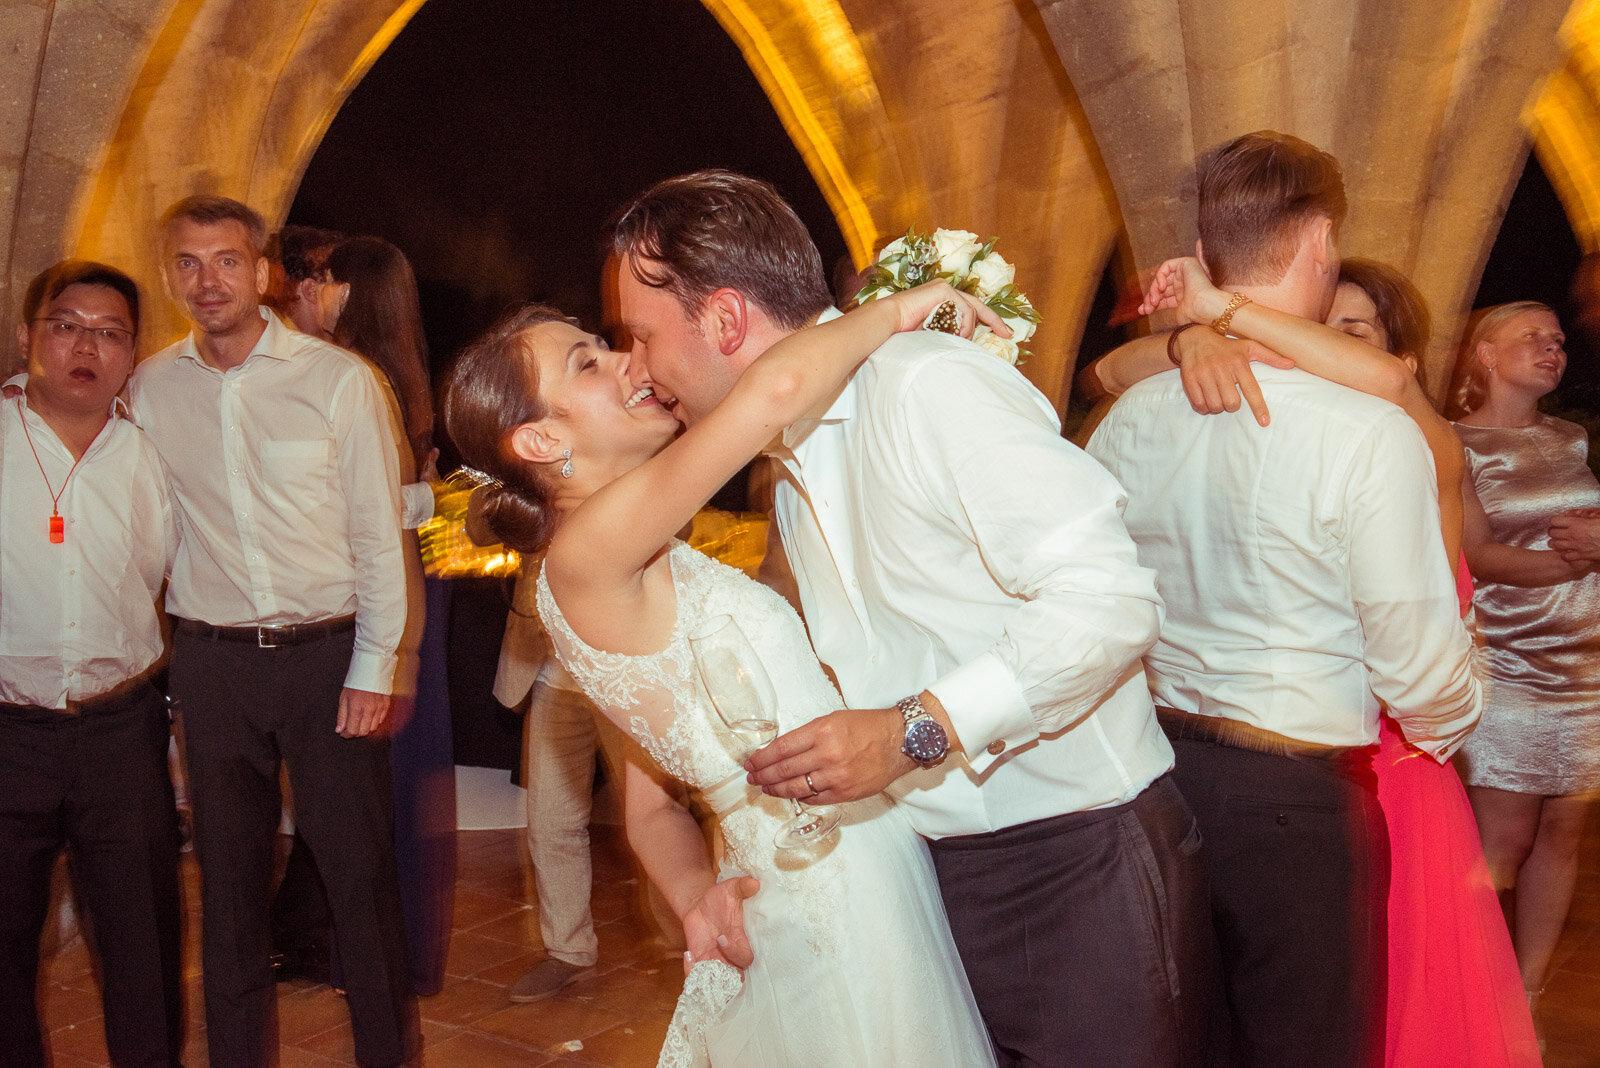 Russian Wedding in Villa Cimbrone Costiera Amalfitana 35.jpg